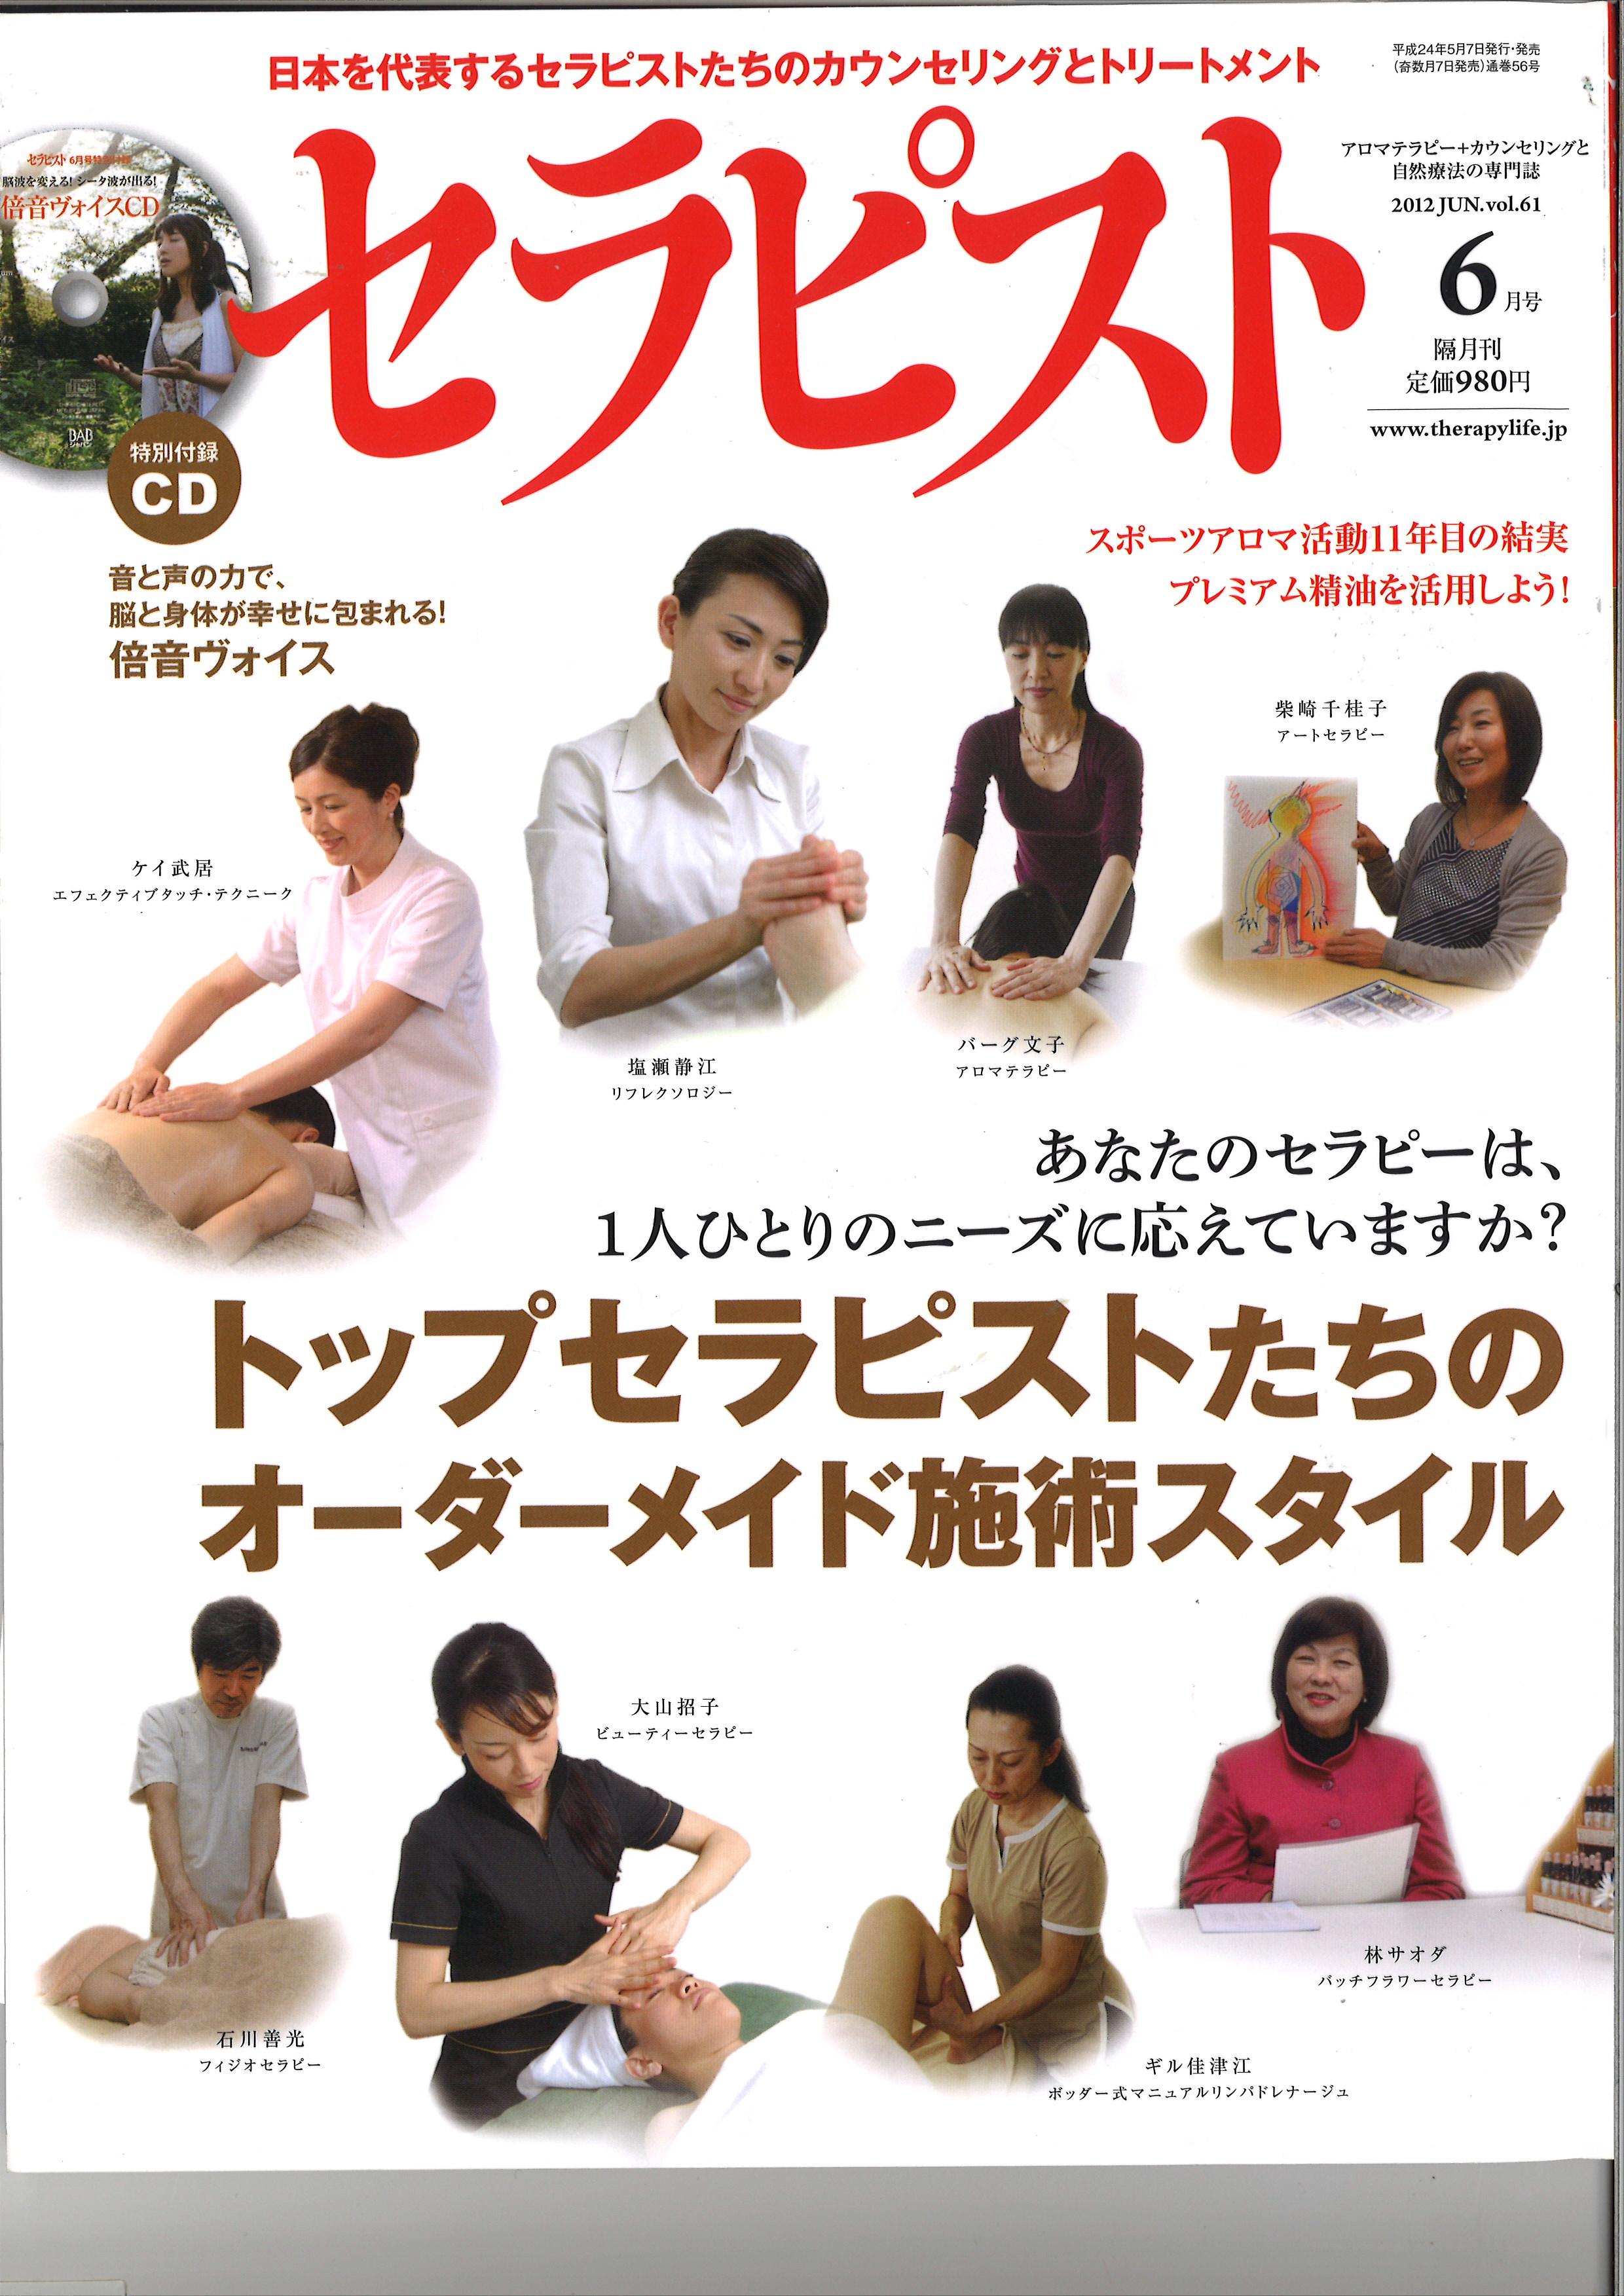 2012.5.BABジャパン『セラピスト』